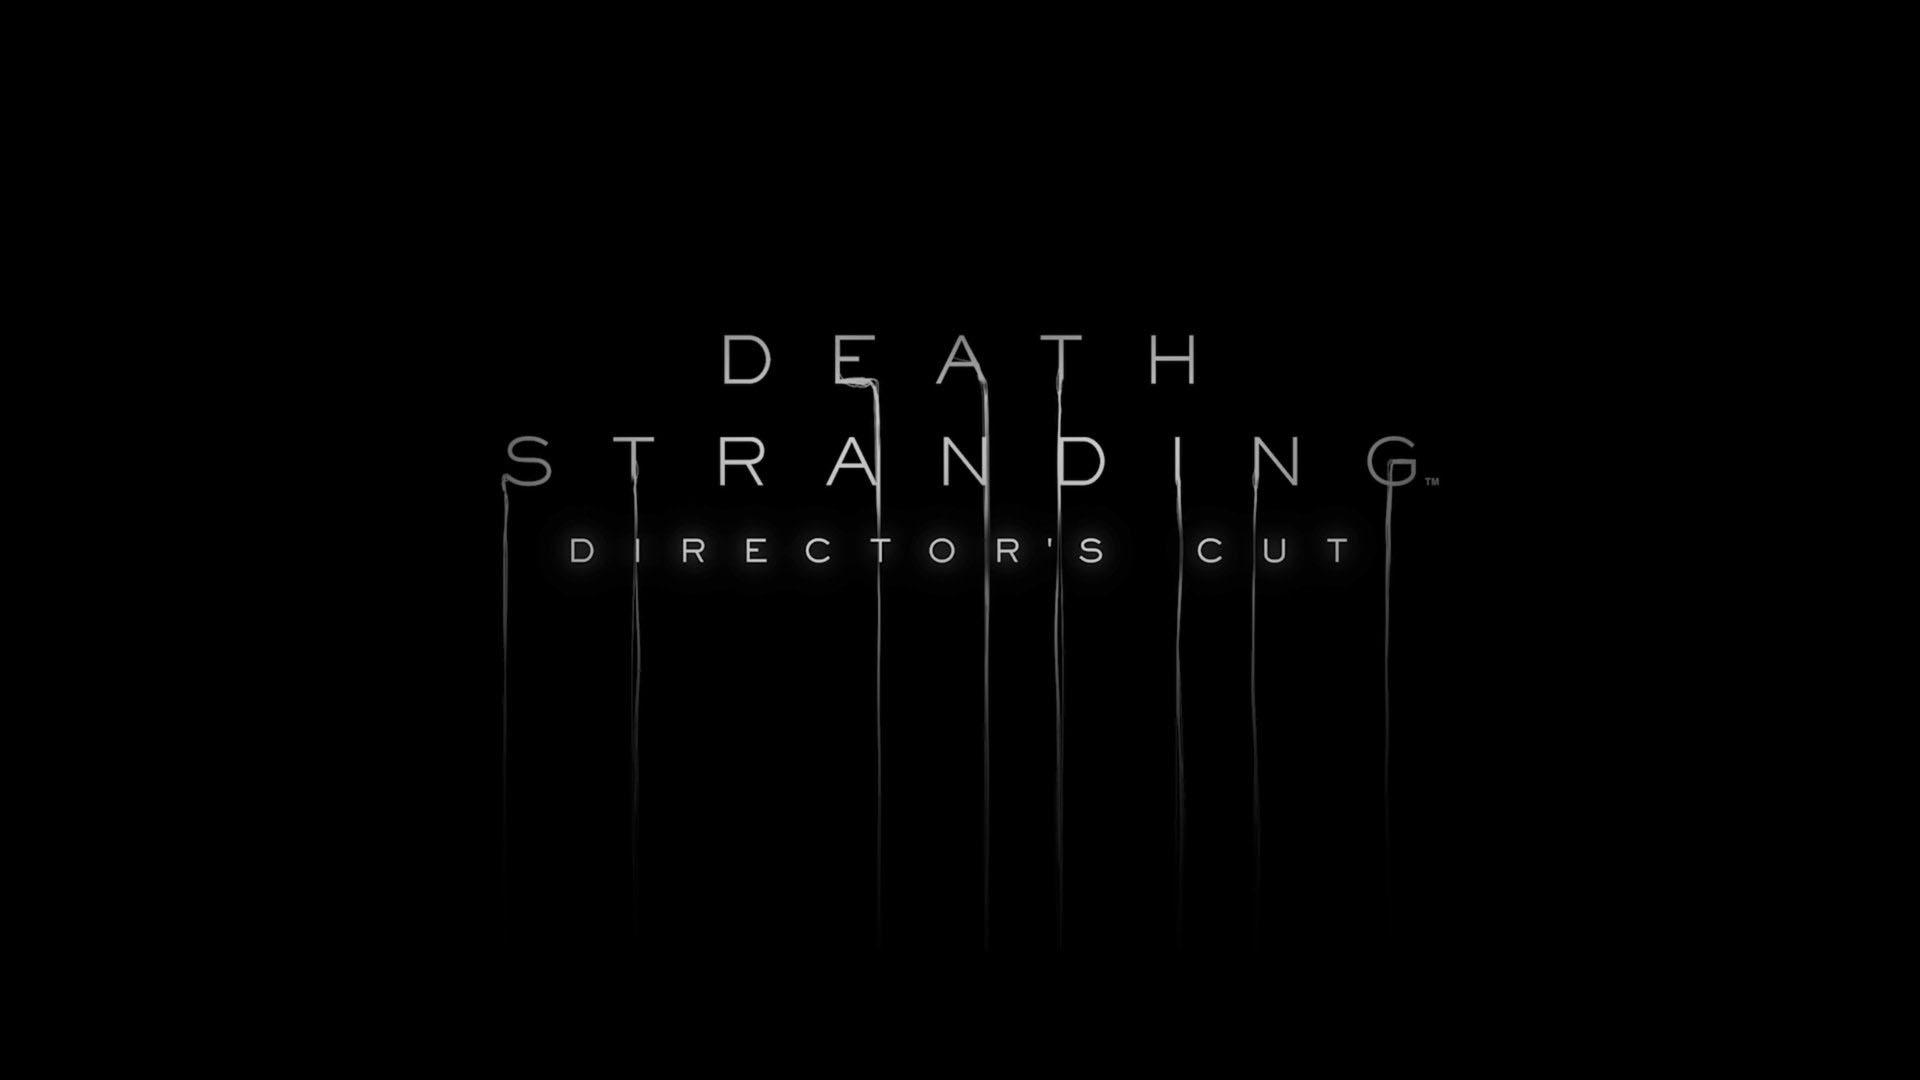 death stranding director's cut stealth